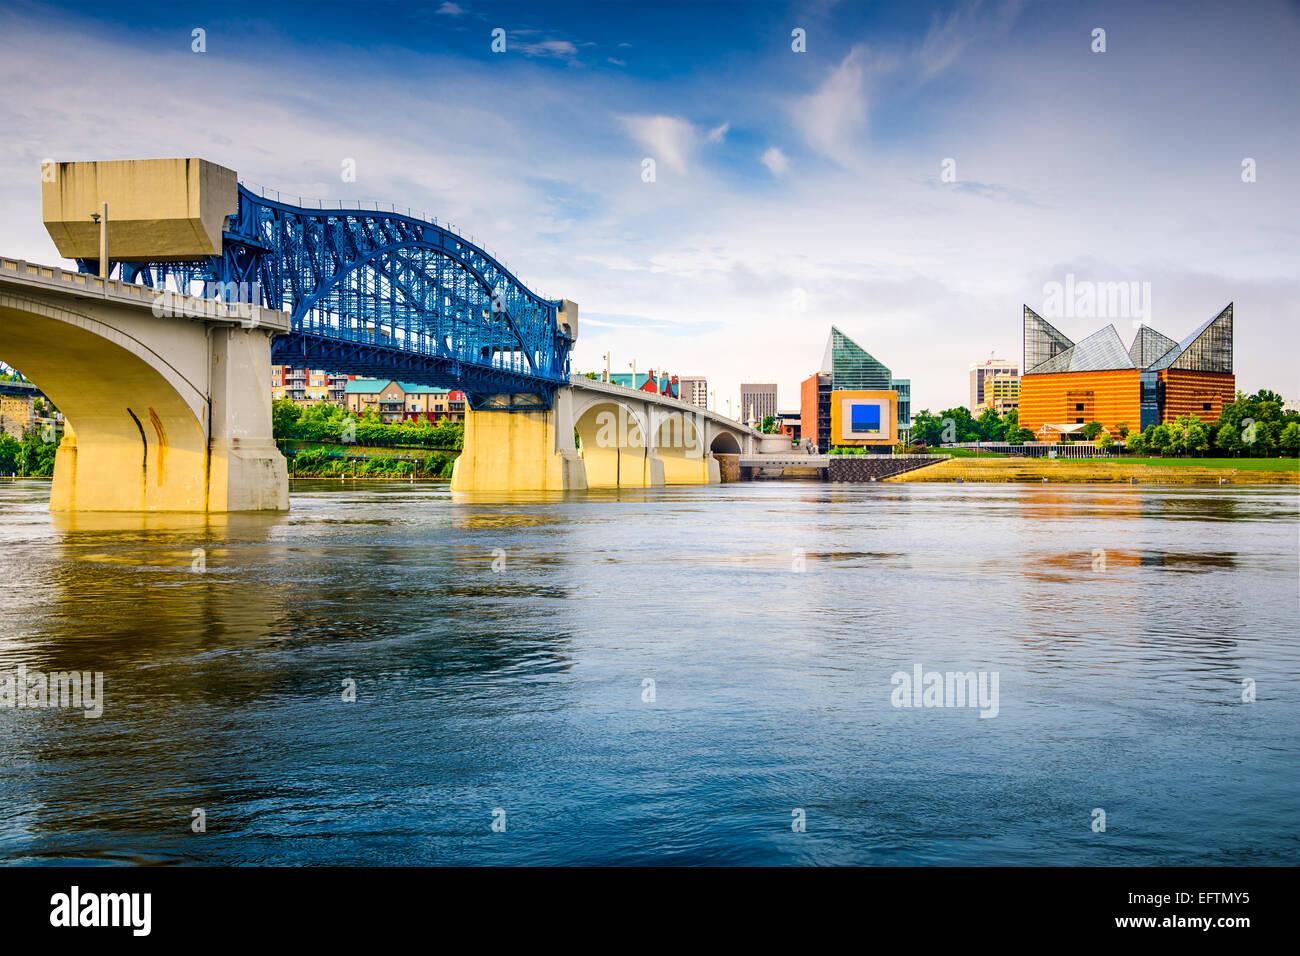 Skyline der Innenstadt Stadt Chattanooga, Tennessee, USA. Stockbild